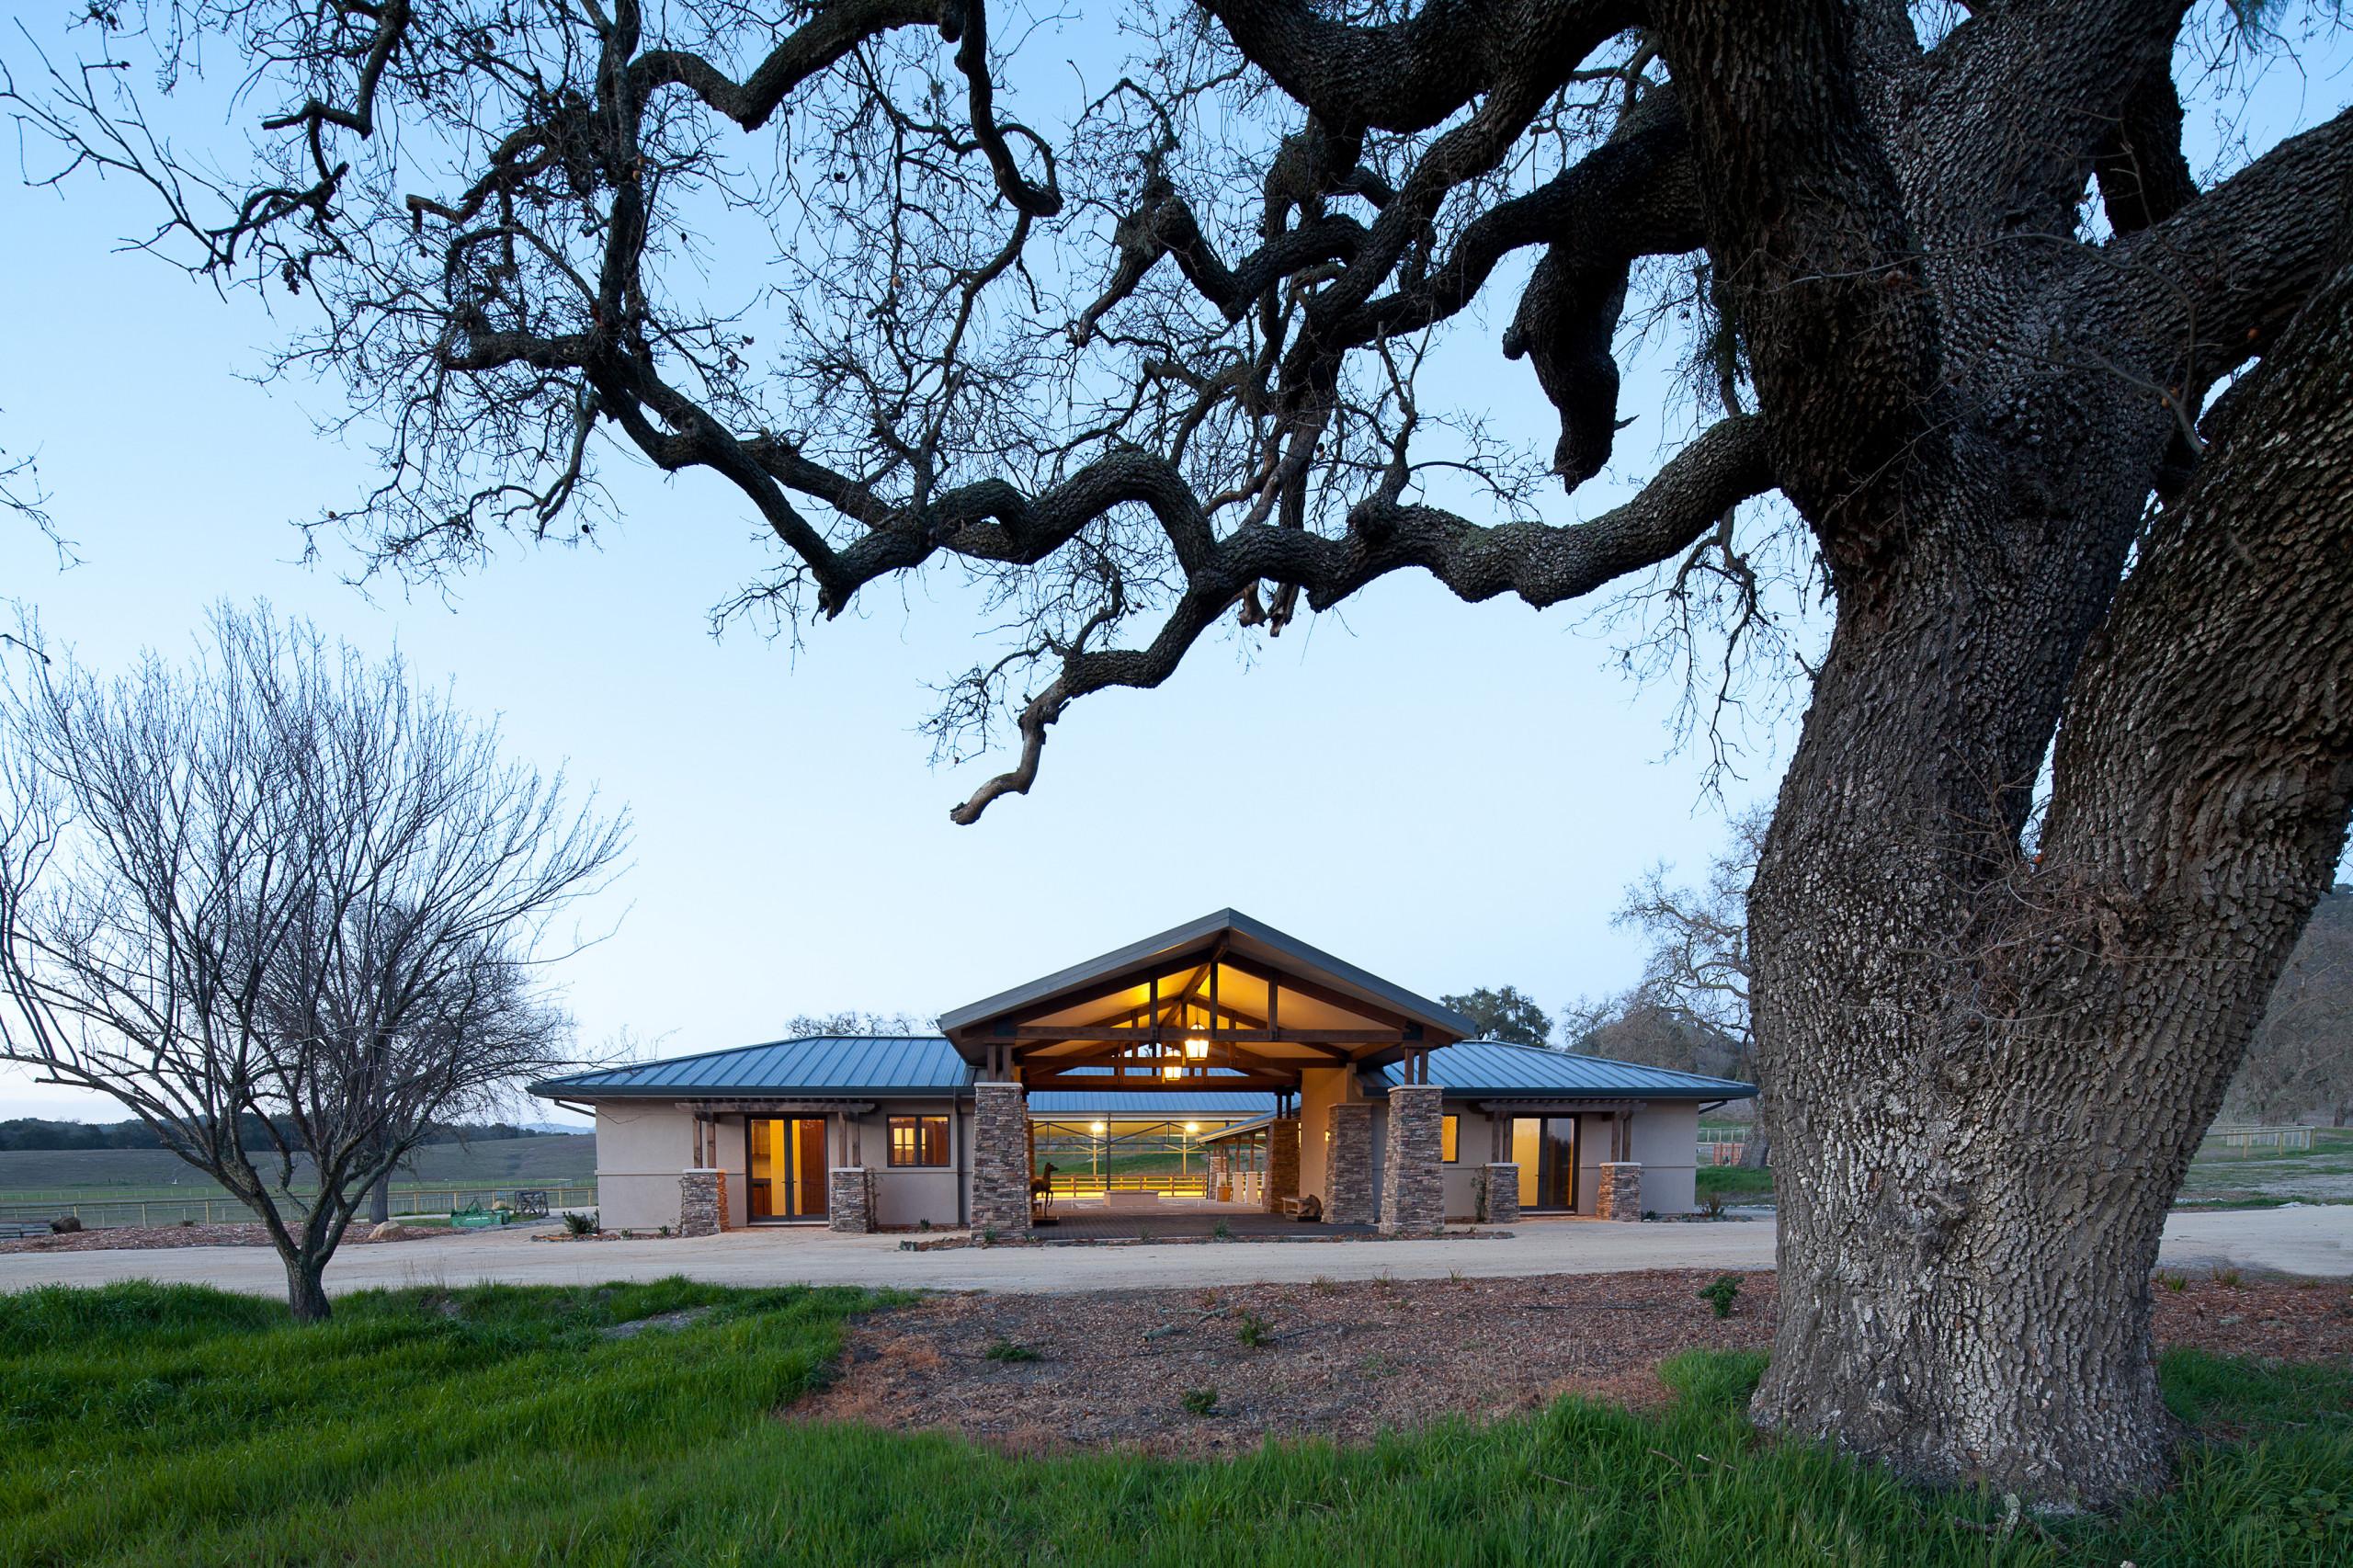 75 Beautiful Farmhouse Stucco Exterior Home Pictures Ideas December 2020 Houzz